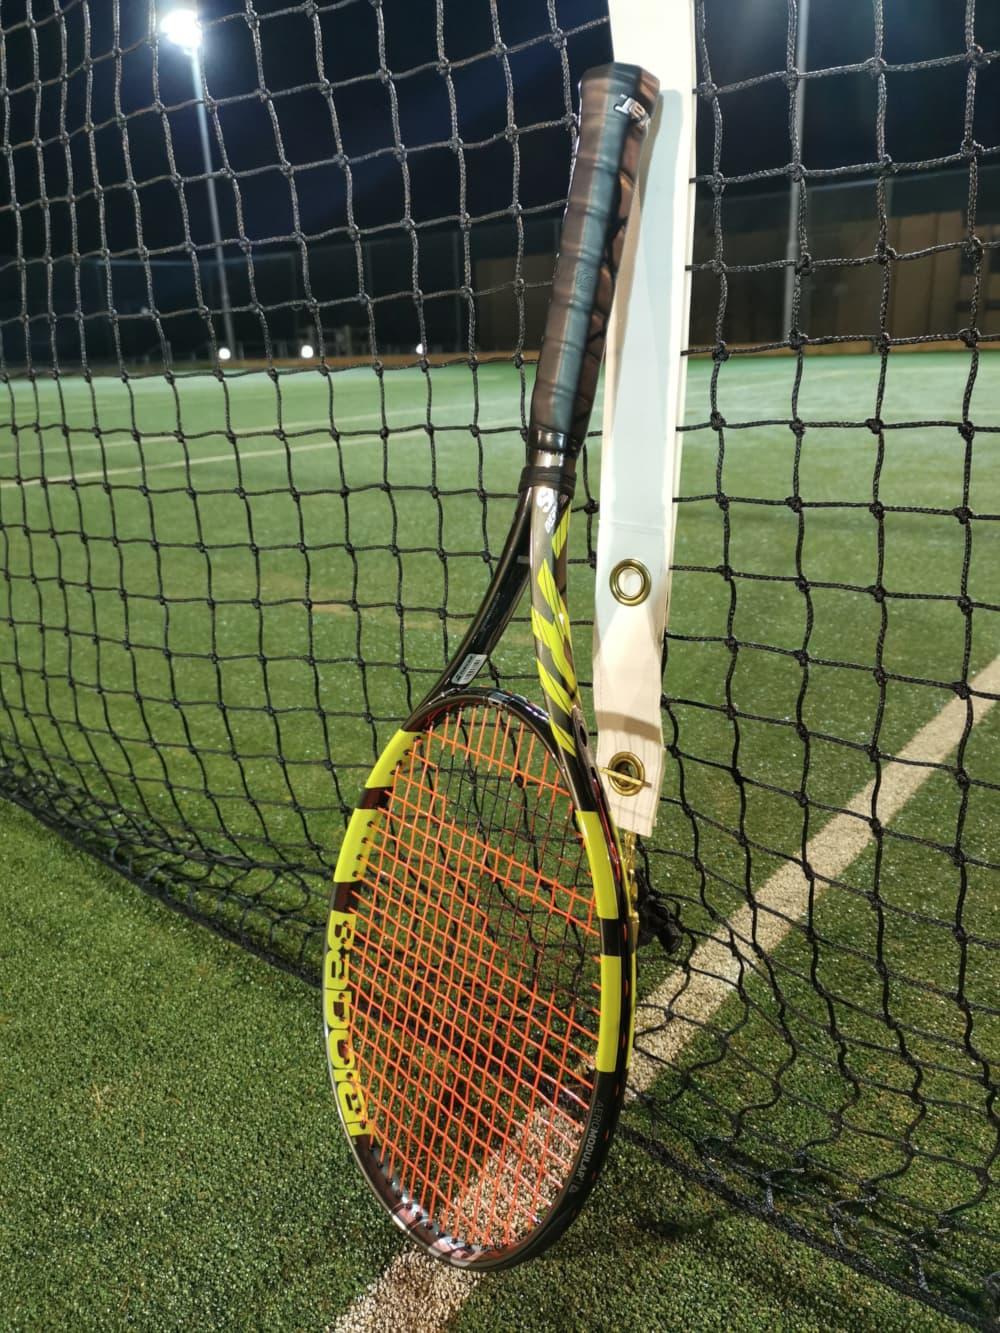 Babolat Pure Aero VS tennis racket leaning against net